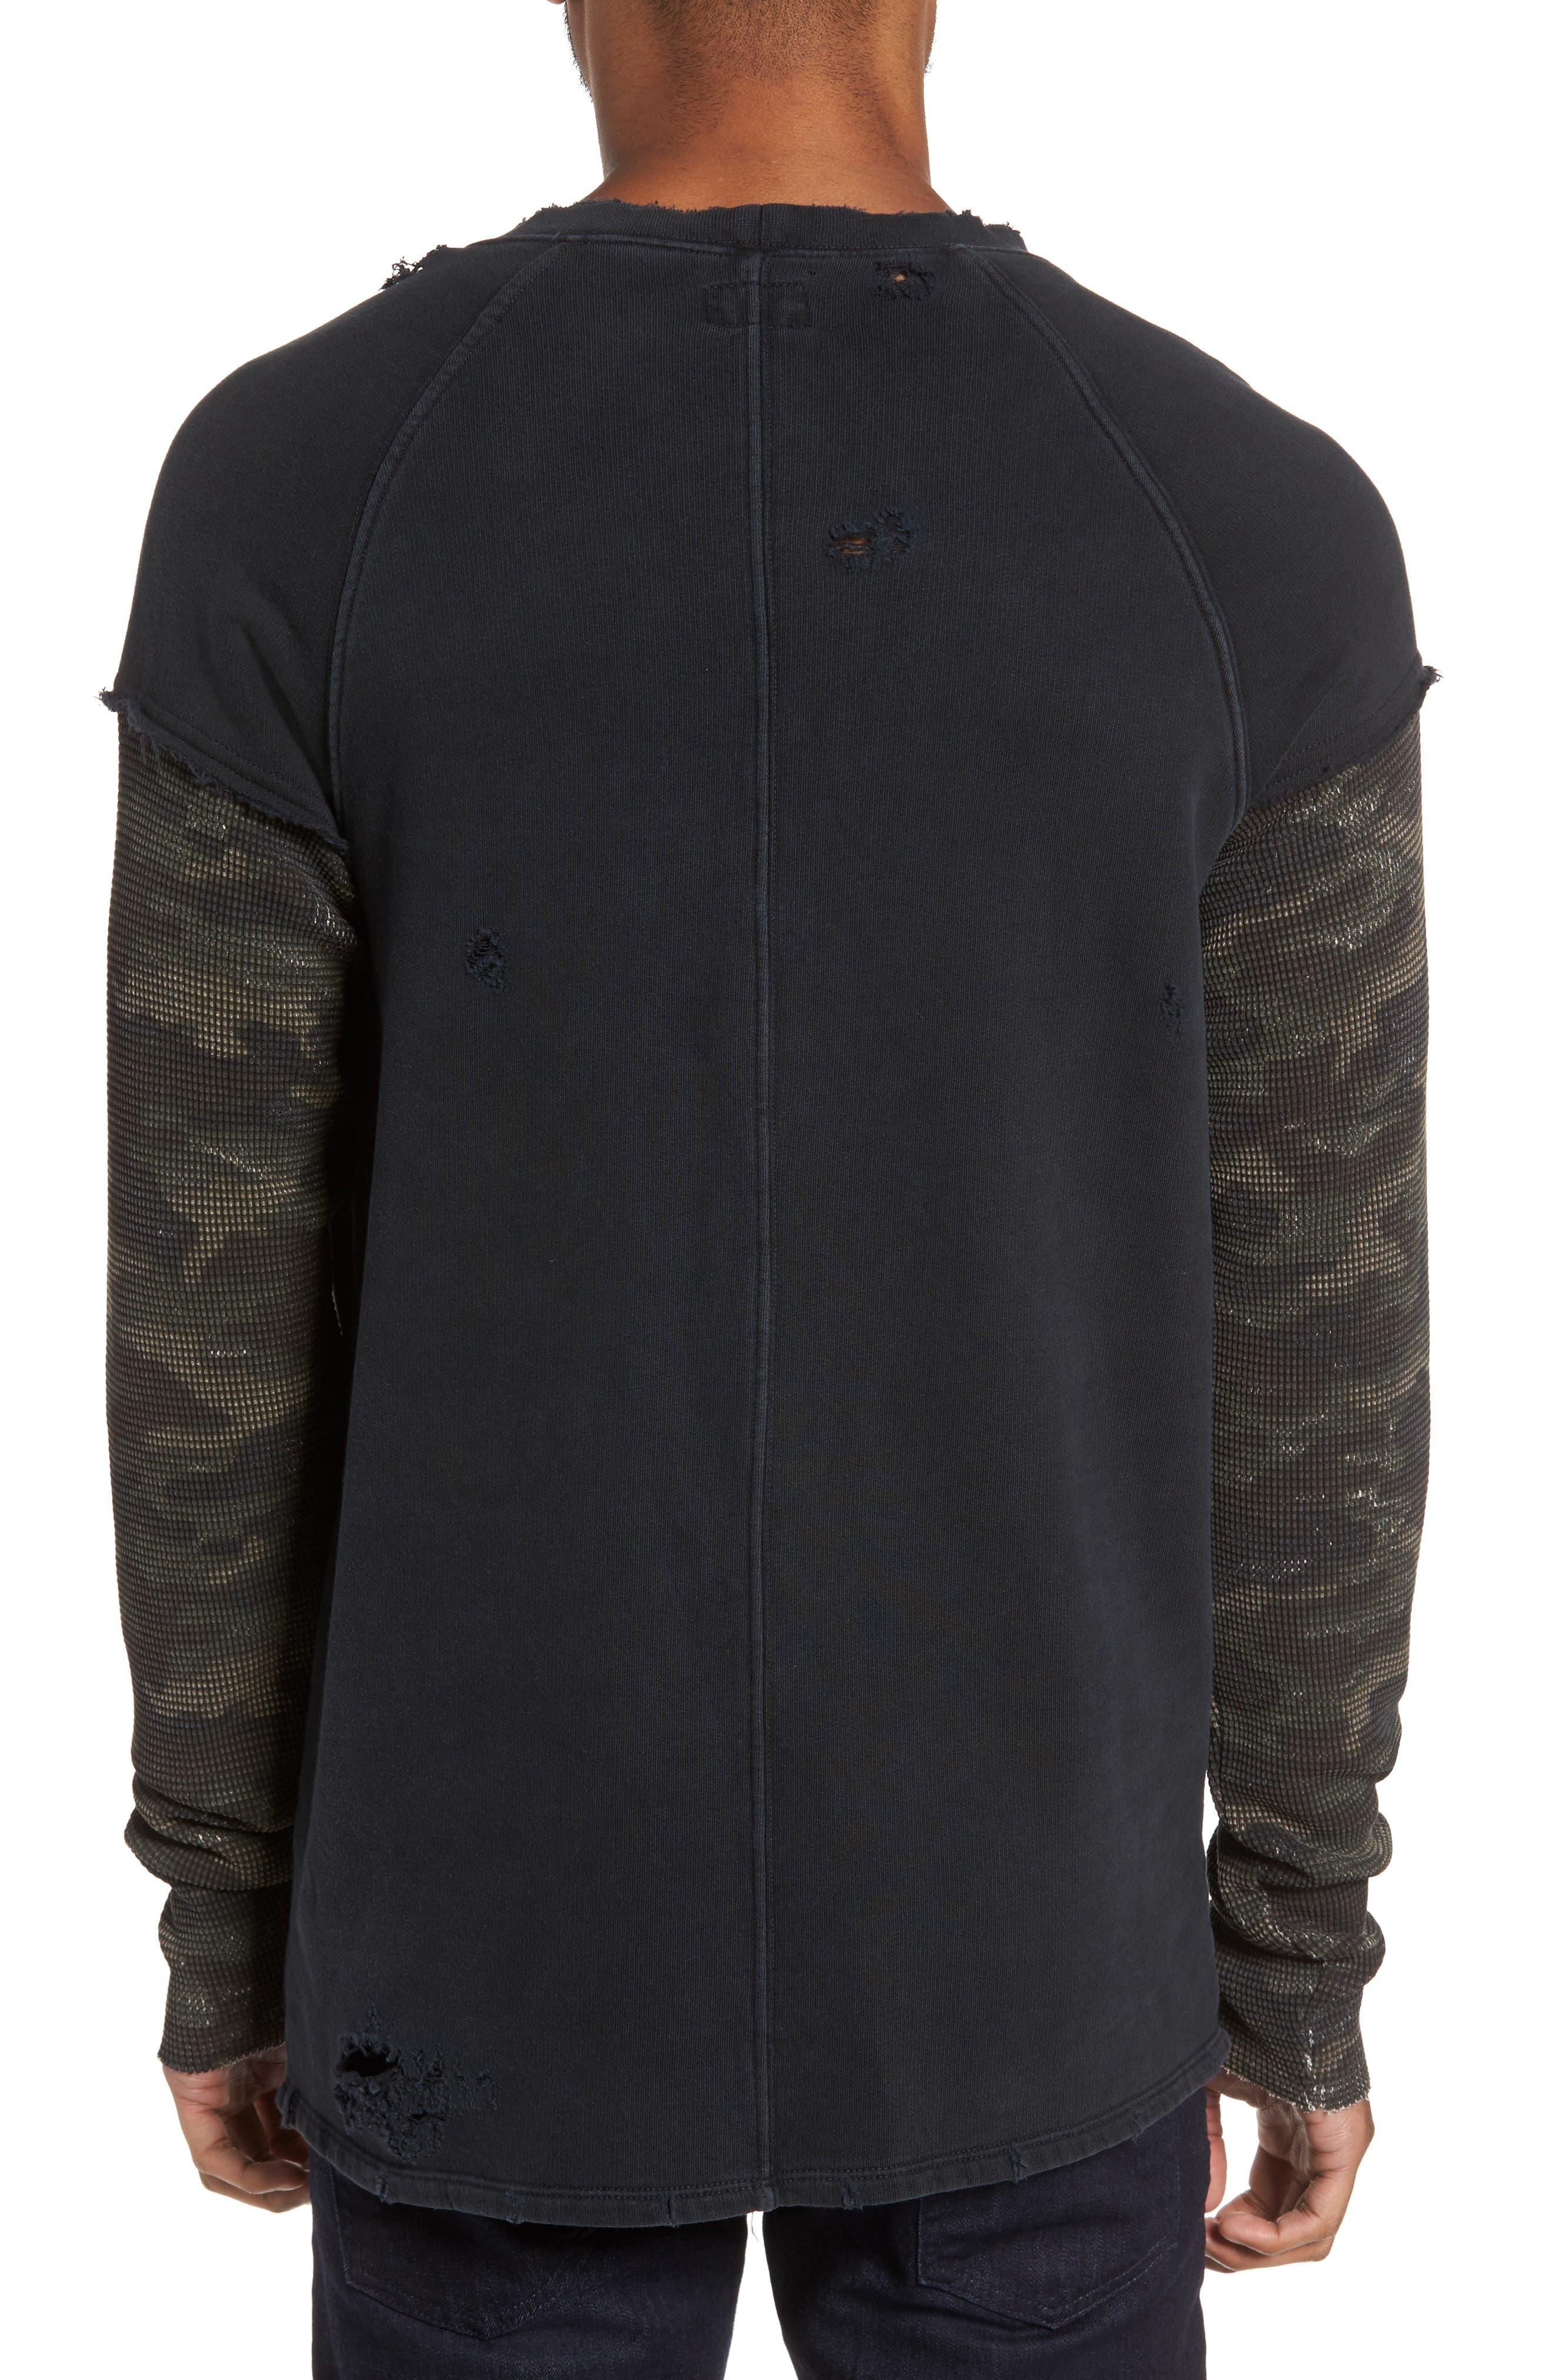 Striker Slim Fit Crewneck Sweatshirt,                             Alternate thumbnail 2, color,